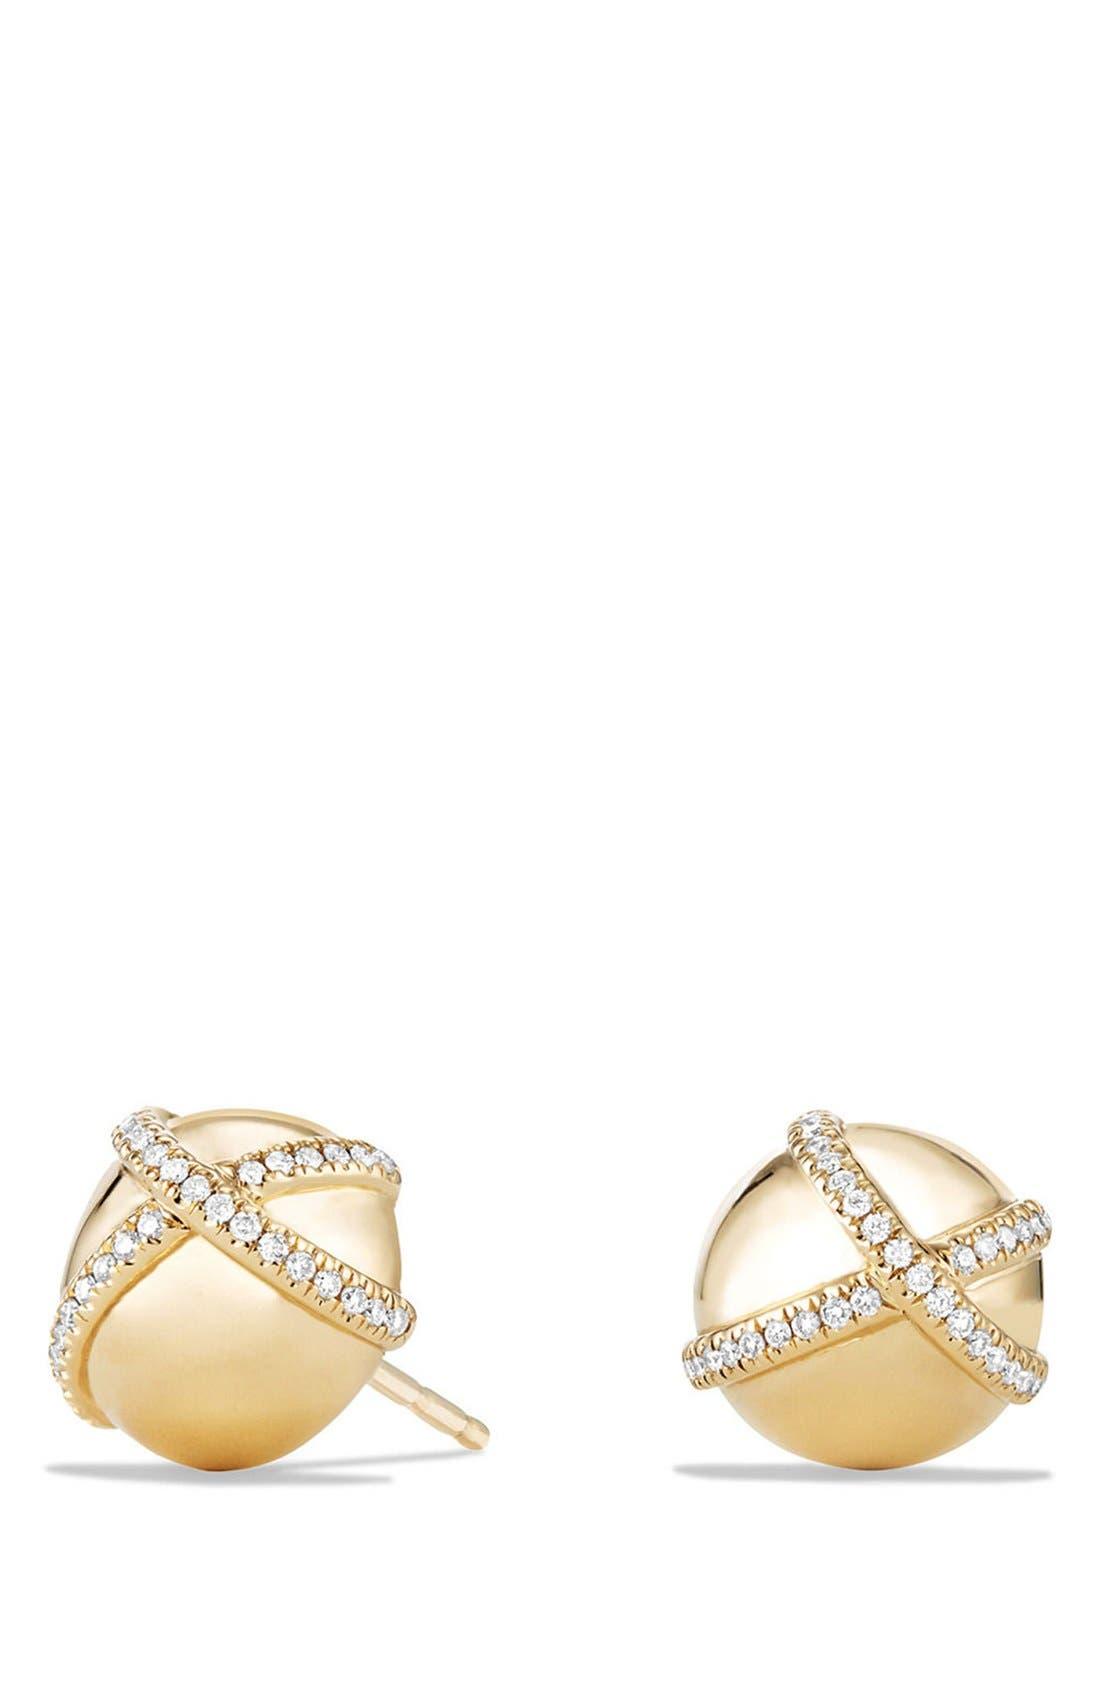 Alternate Image 1 Selected - David Yurman 'Solari' Wrap Stud Earrings with Pavé Diamonds in 18K Gold